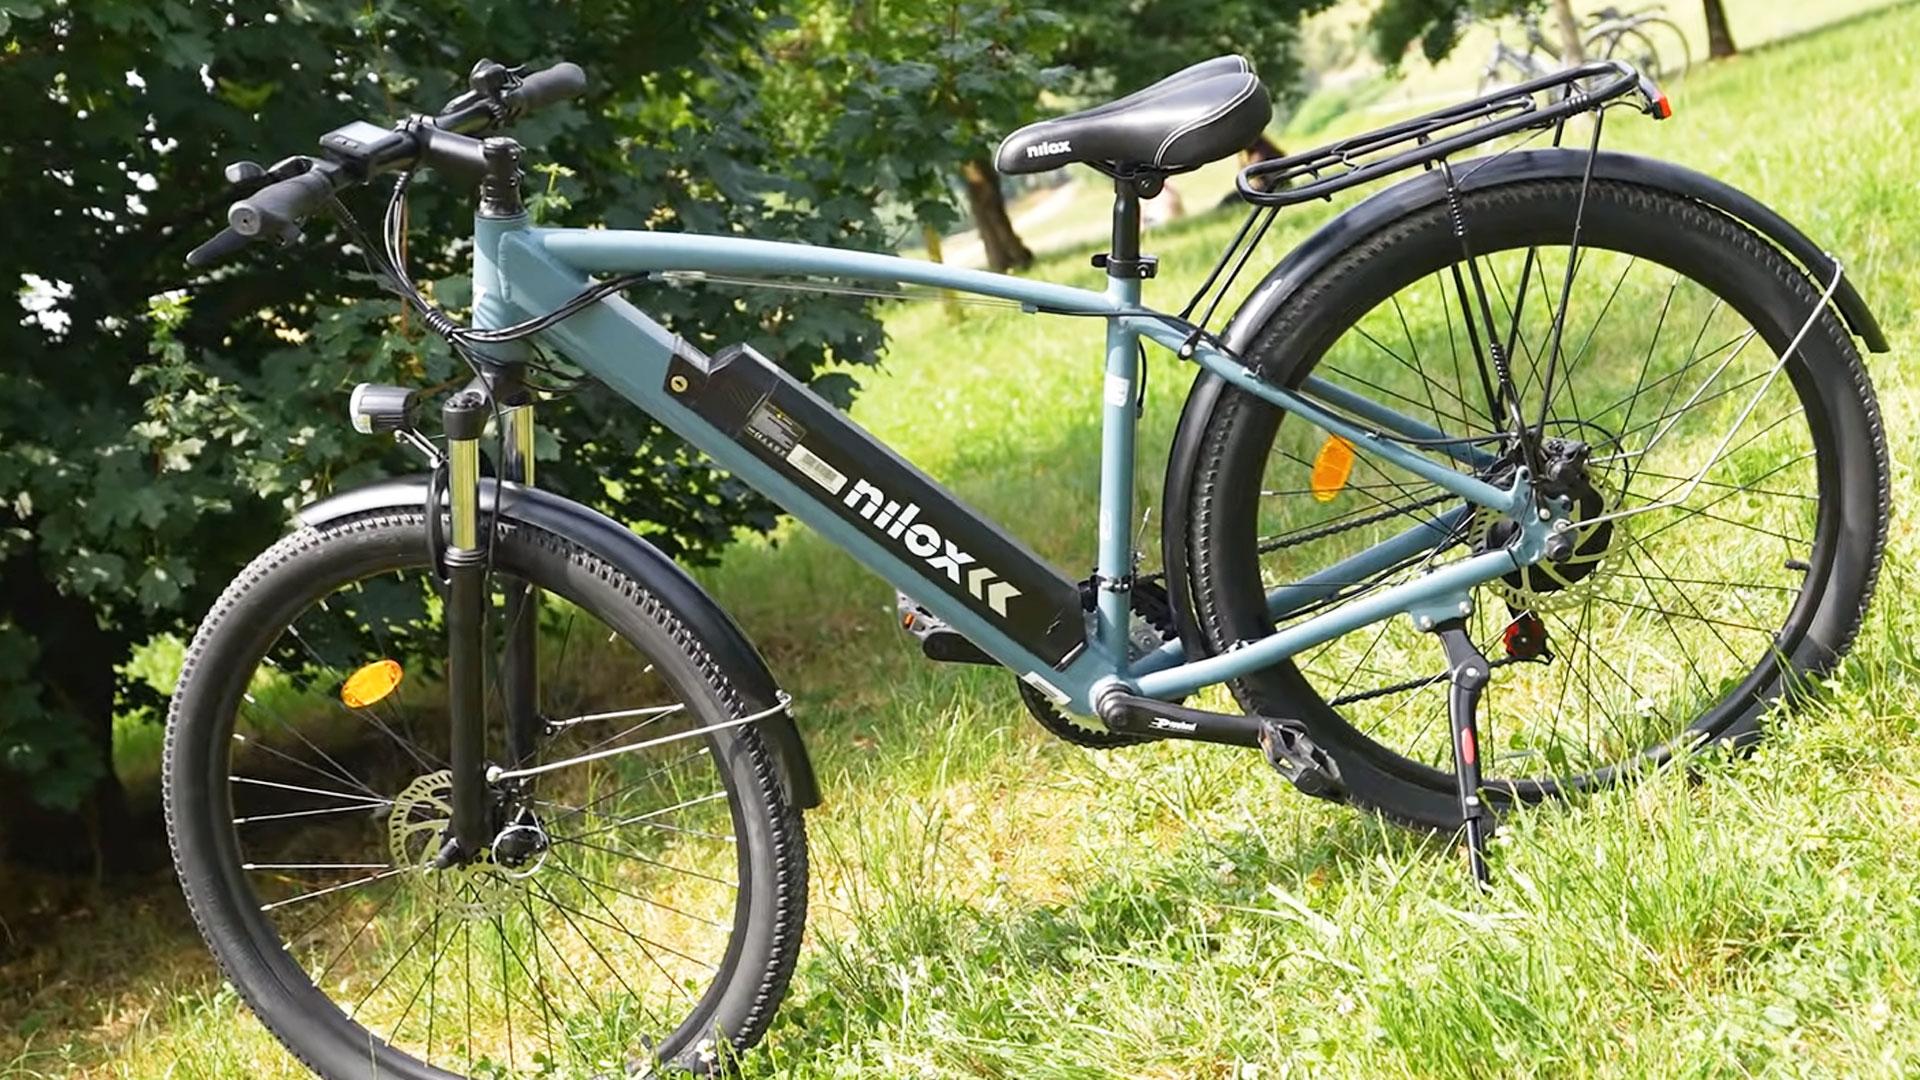 Nilox X7 Electric Mountain Bike